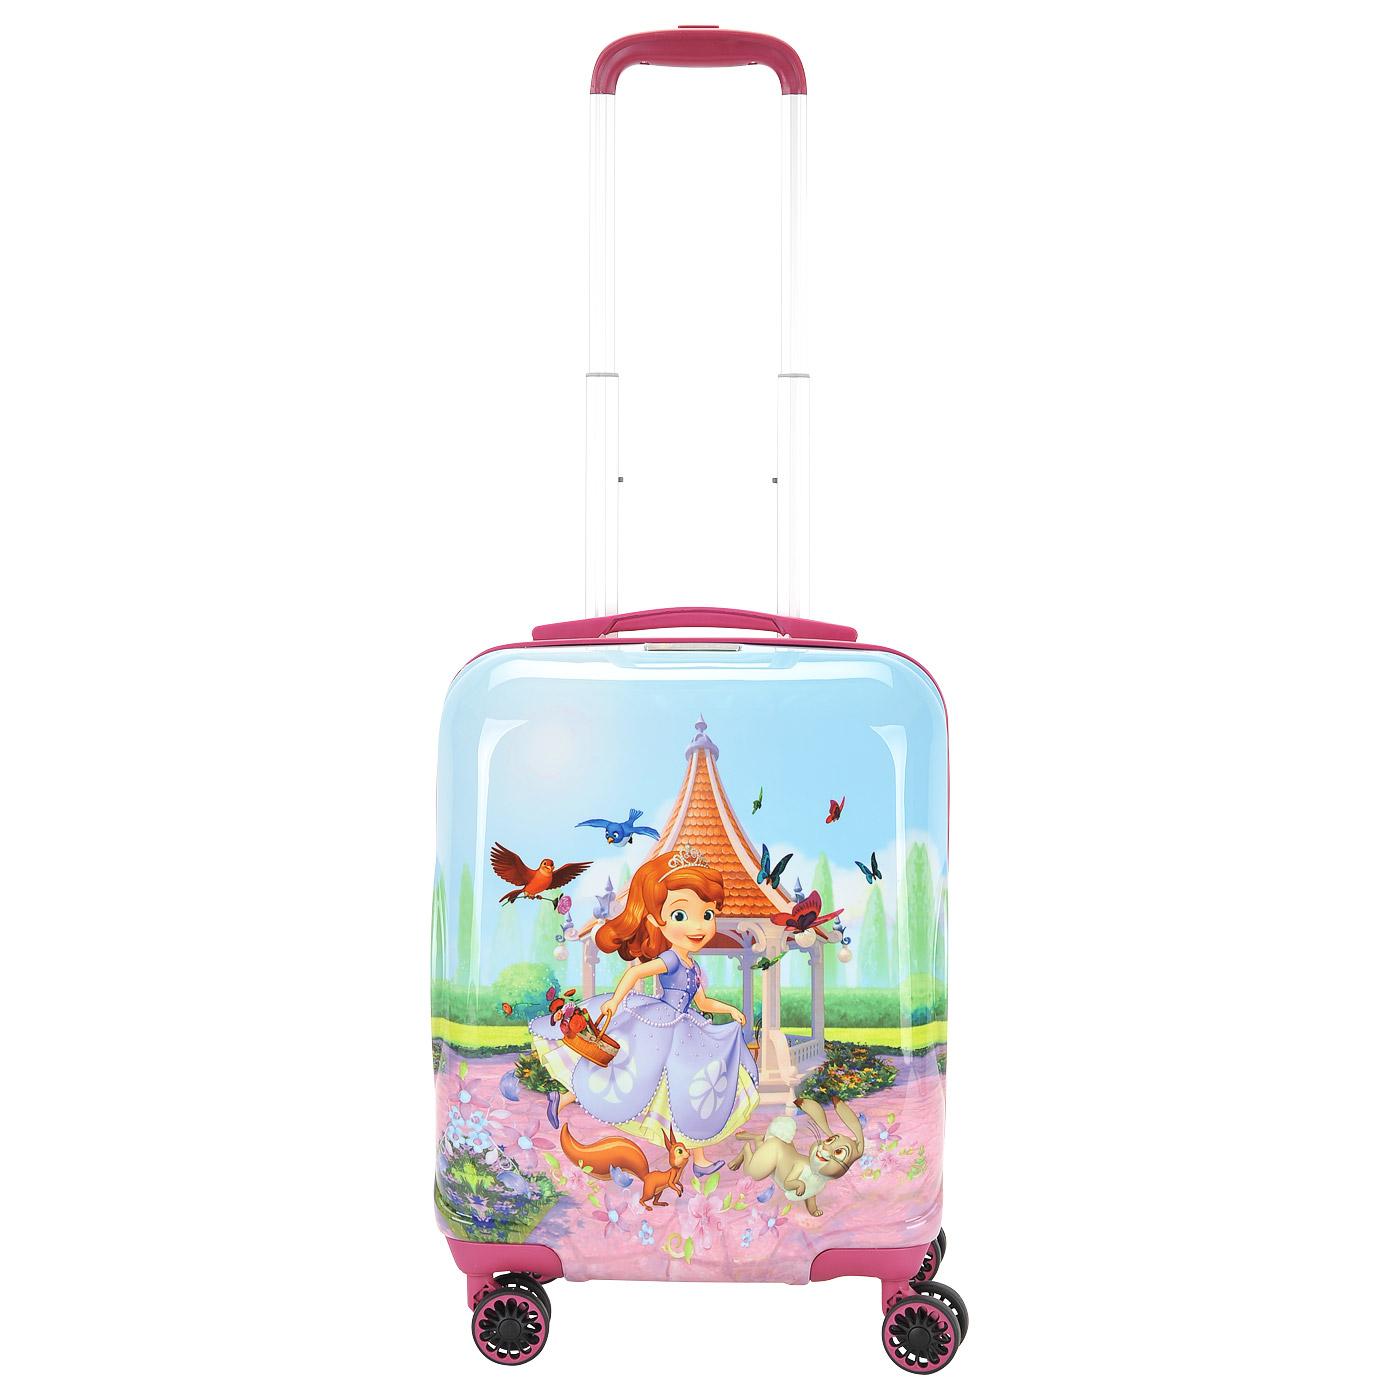 e32f686e1a6f Детский чемодан на колесах Sun Voyage Disney SV017-AC042-16 ...